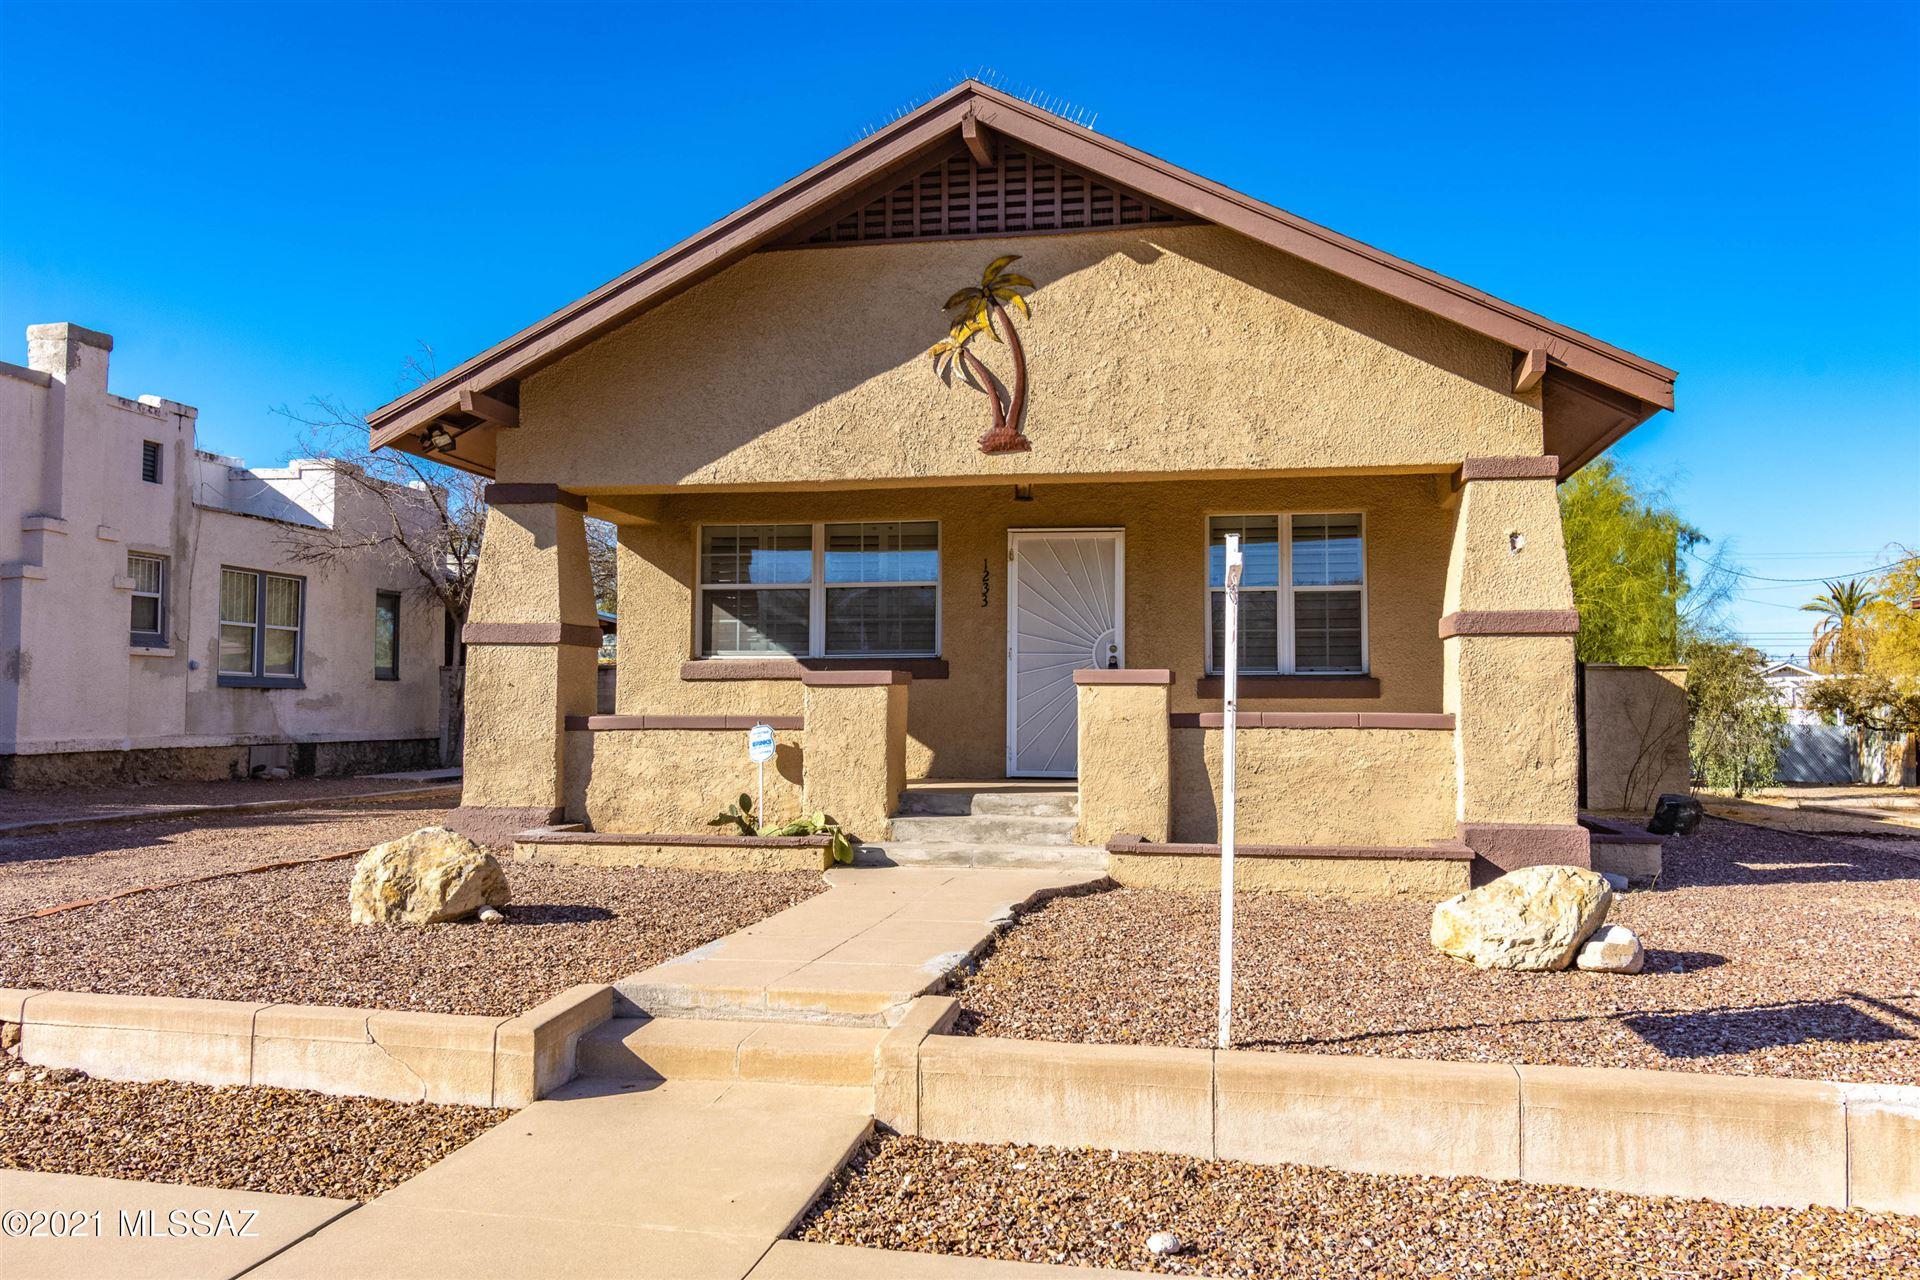 1233 N 1St Avenue, Tucson, AZ 85719 - MLS#: 22030732